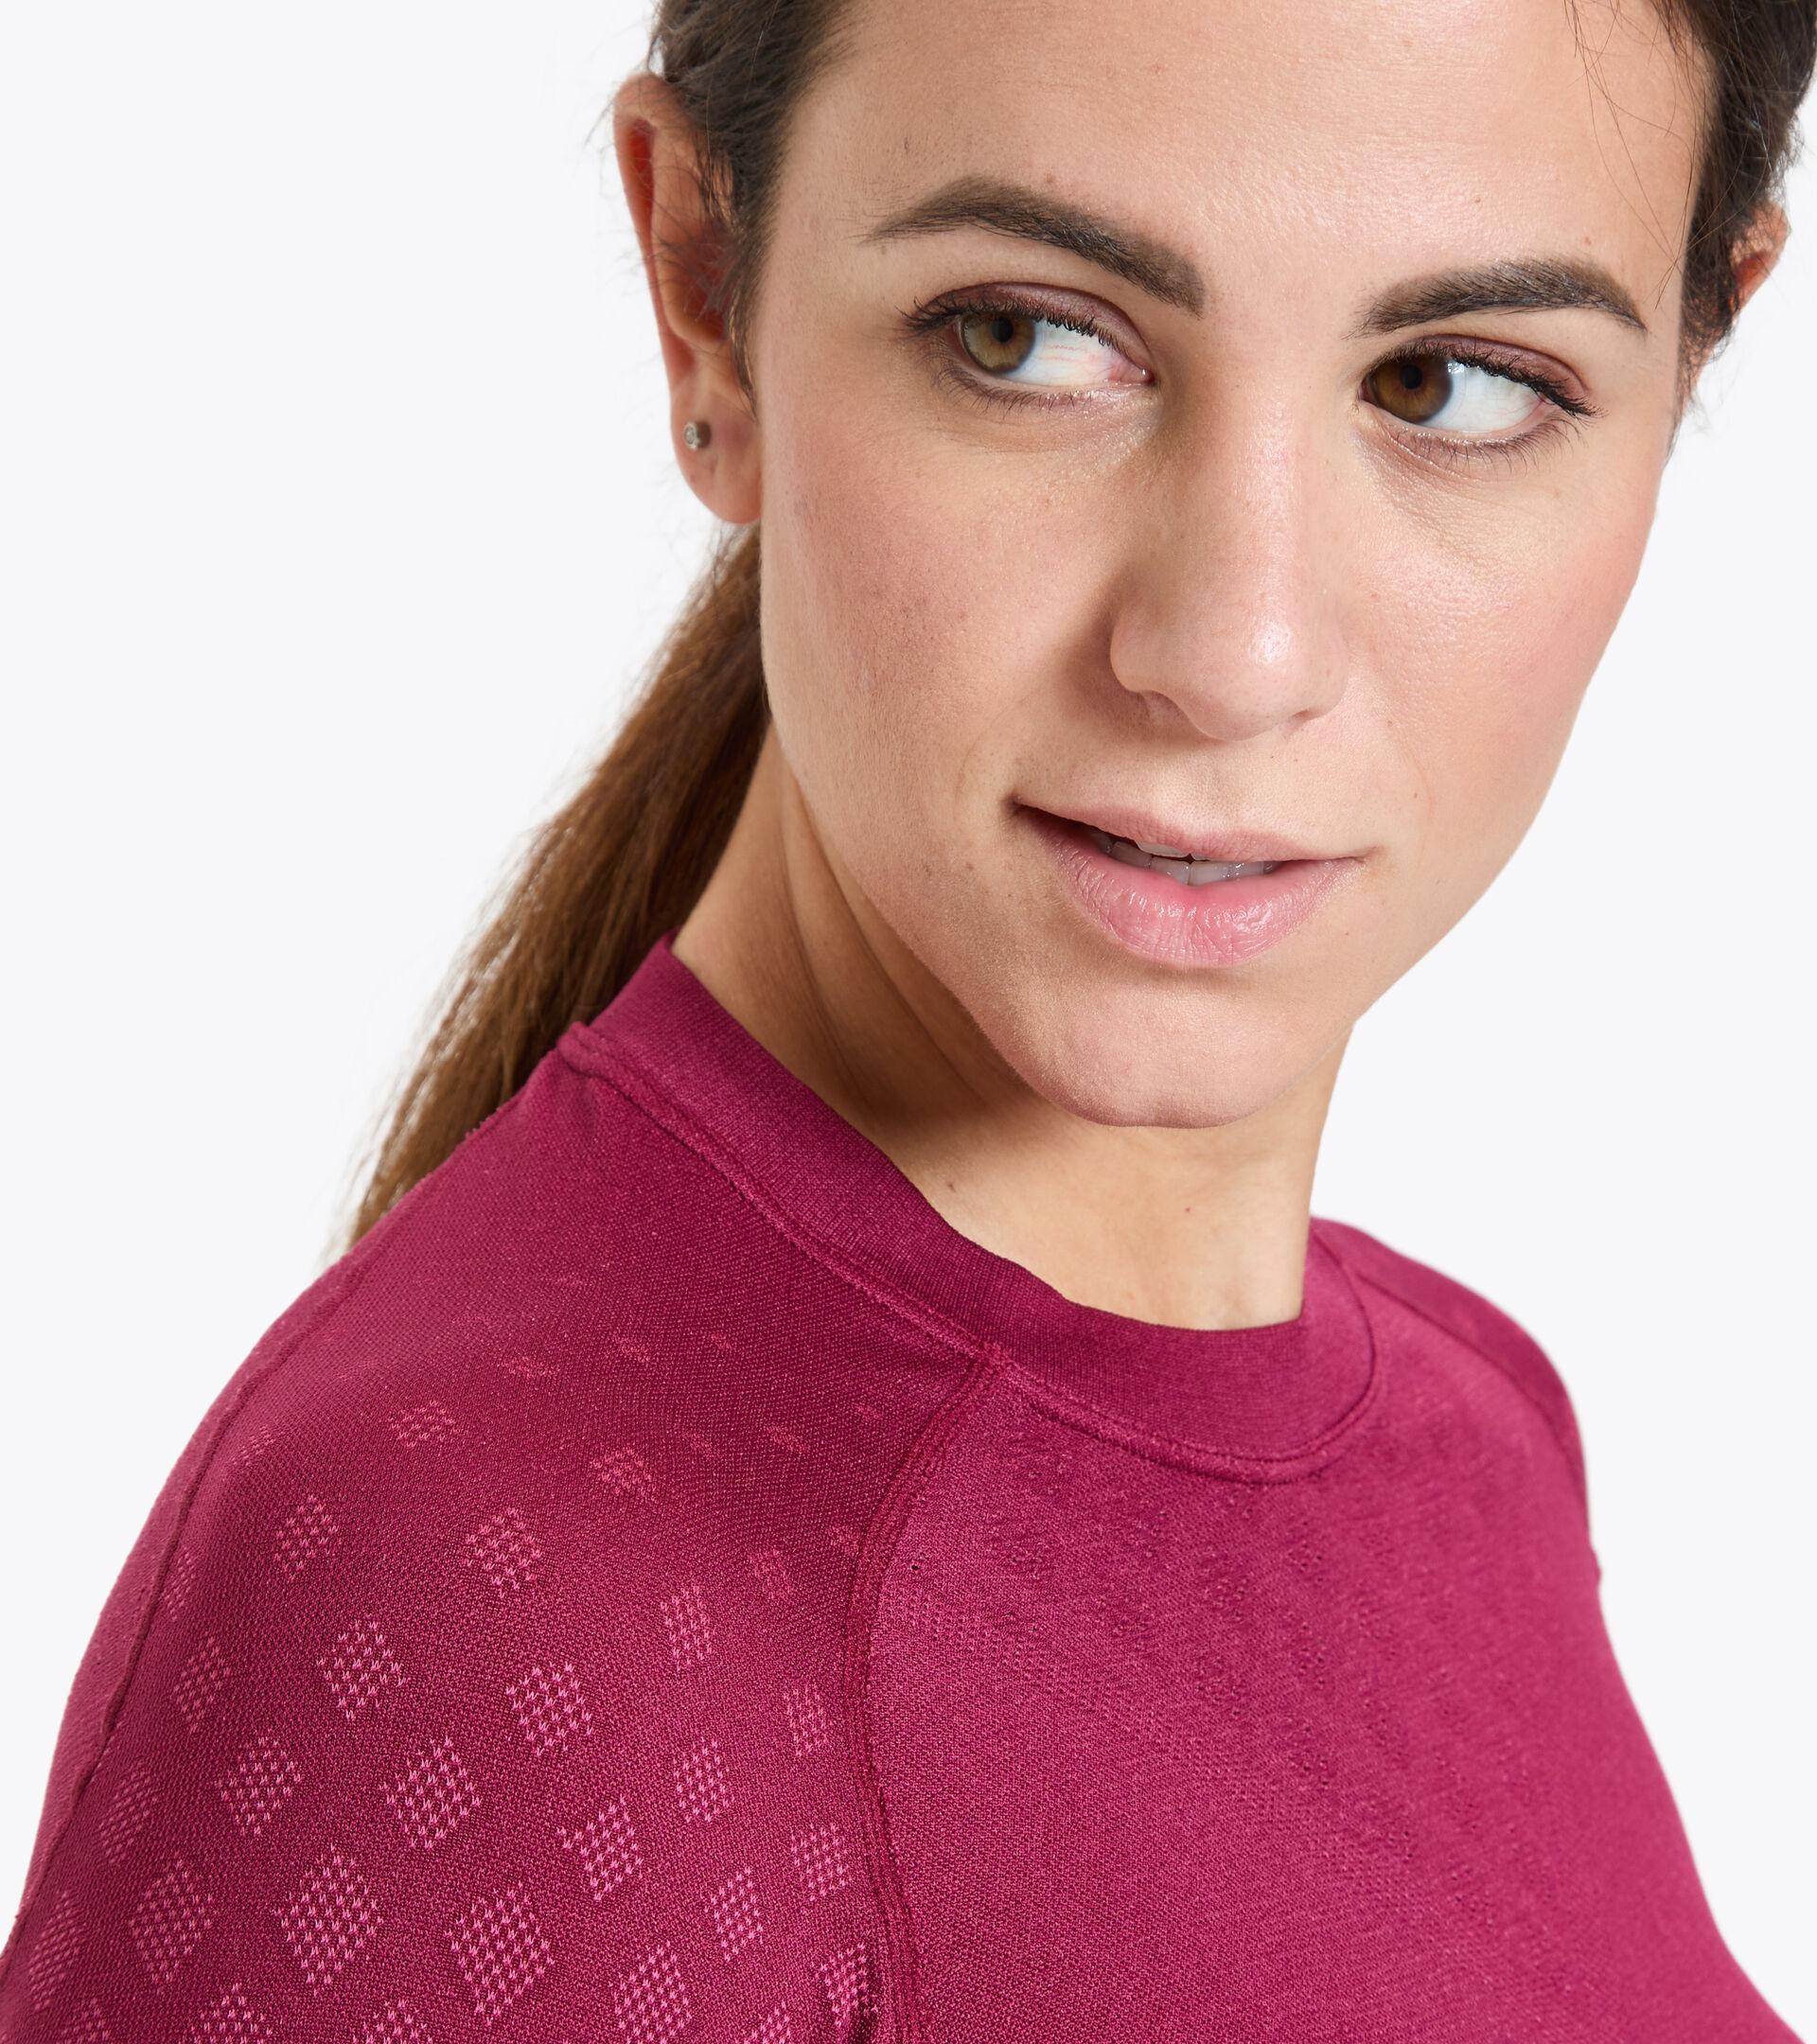 Camiseta de entrenamiento de manga larga - Mujer L. LS T-SHIRT ACT RODODENDRO - Diadora